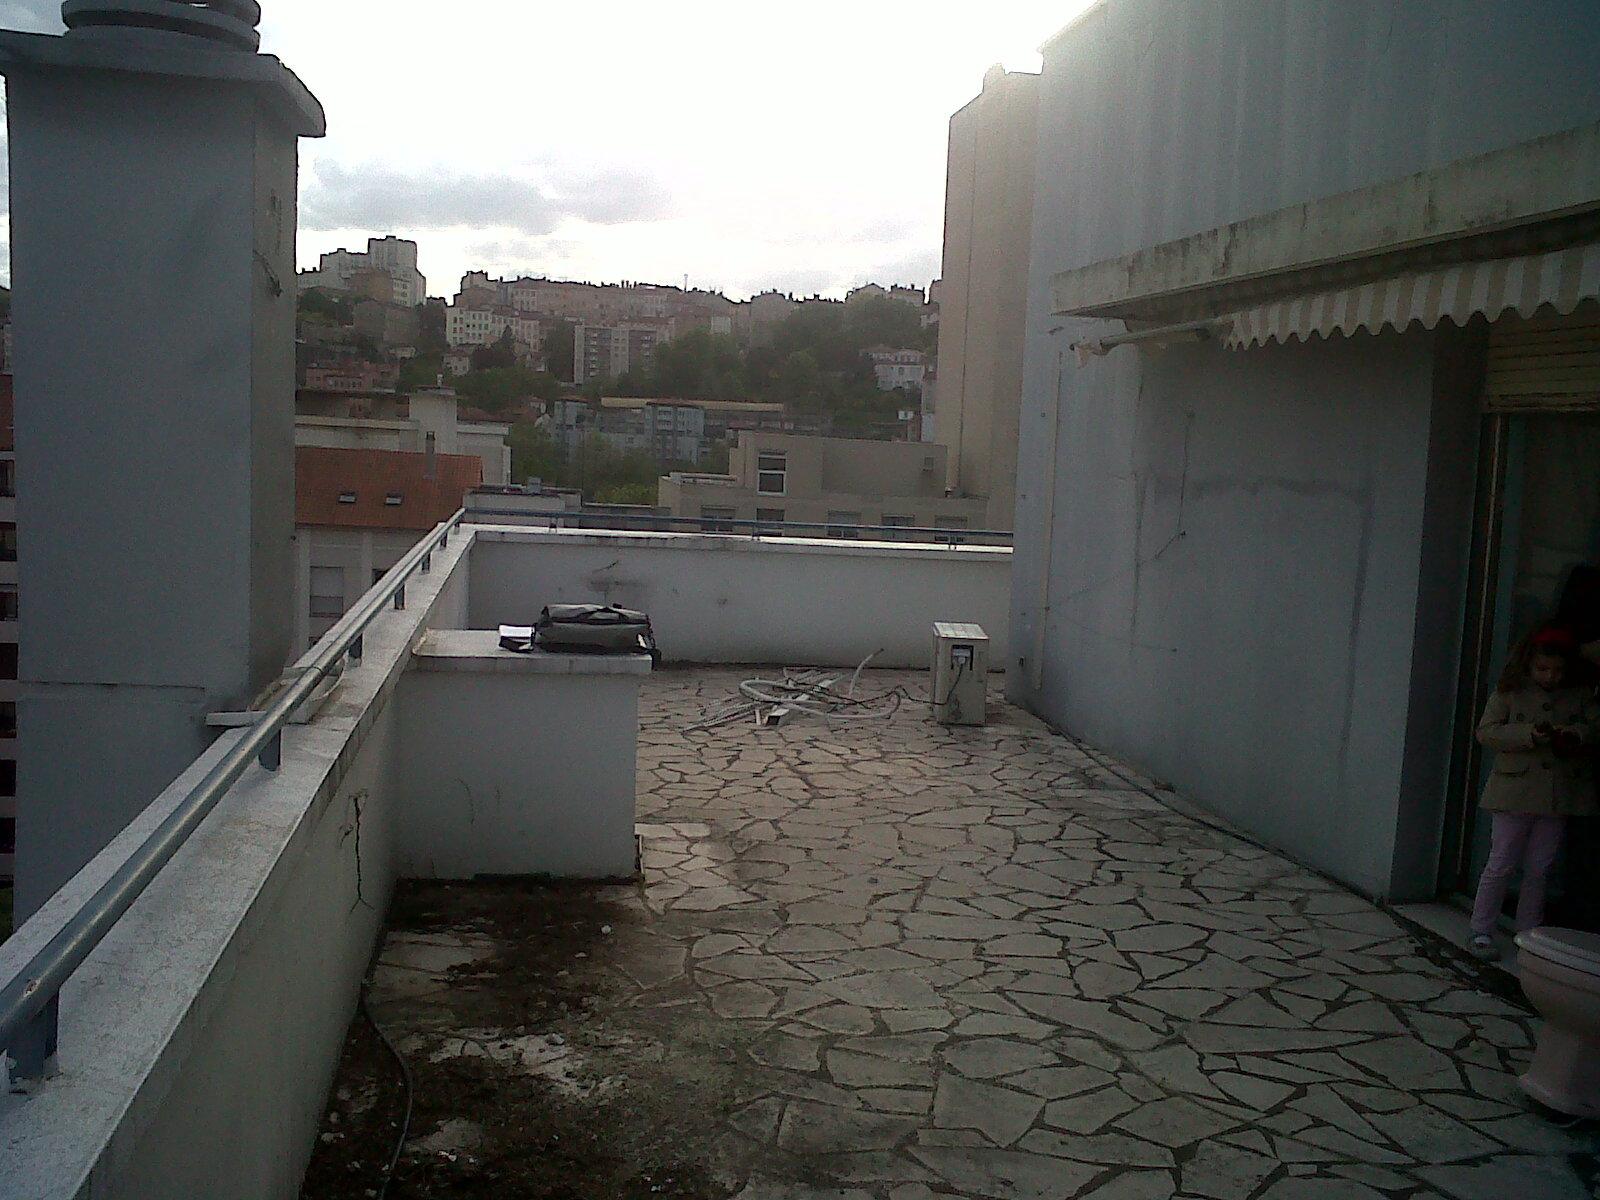 Terrasse Robinier Lyon : Terrasse abandonn u00e9e u00e0 Lyon, avec vue extraordinaire sur